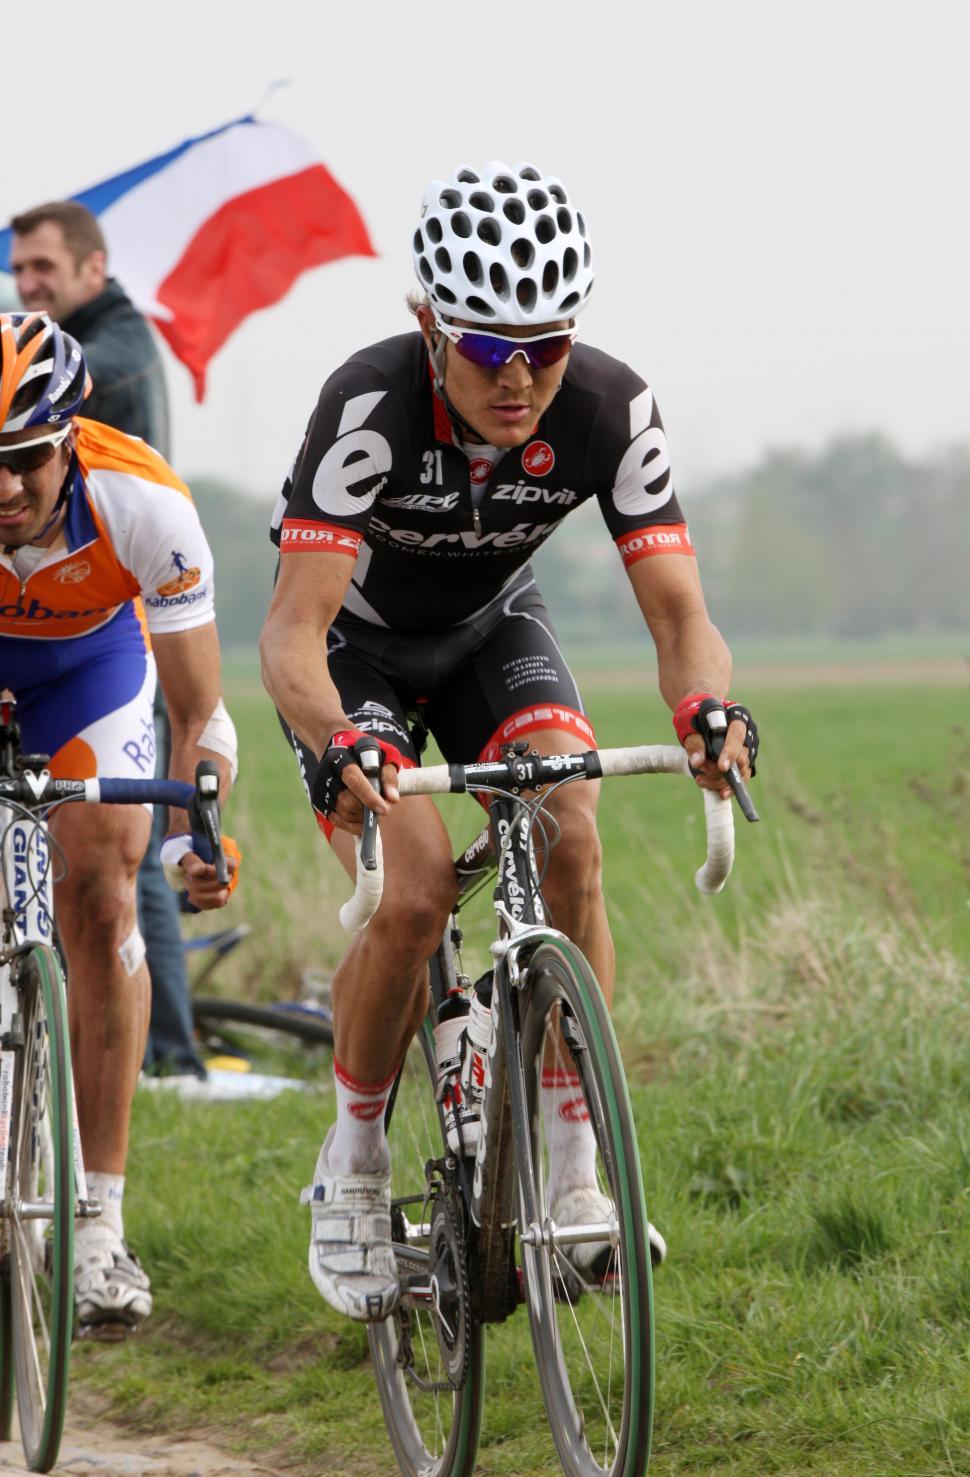 Heinrich Haussler Paris Roubaix ©Photosport International